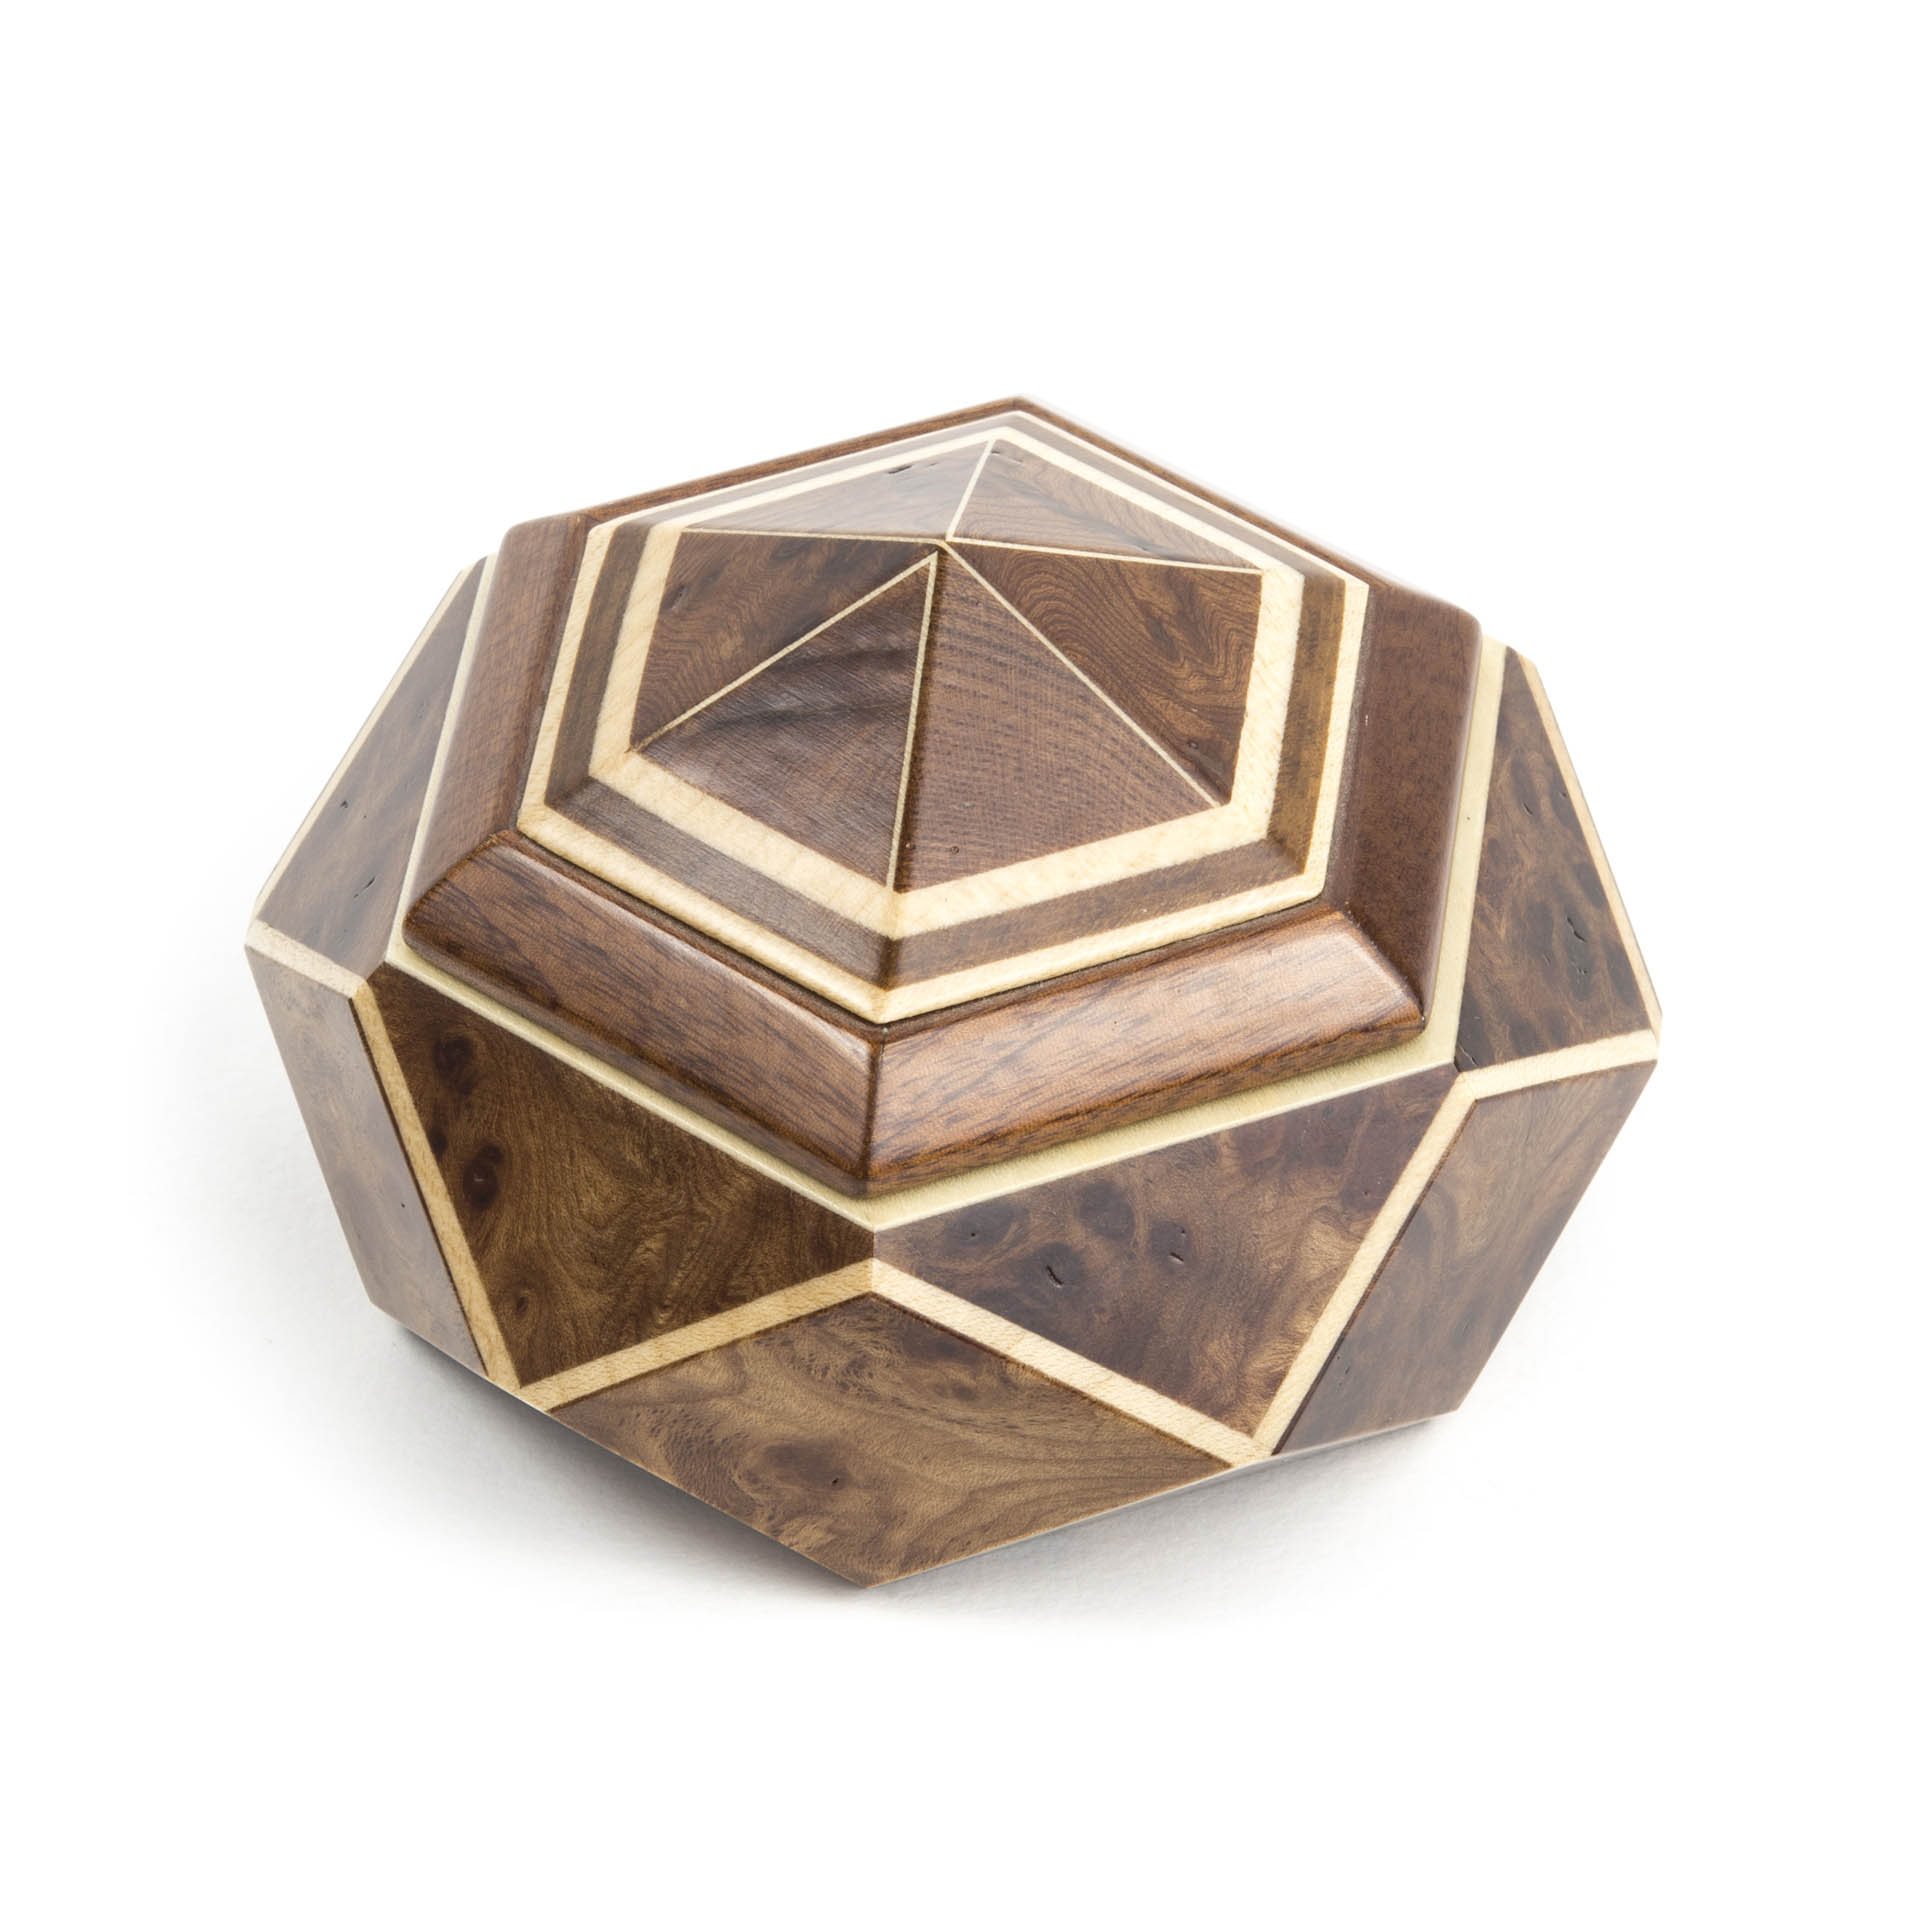 Diamond Shape Wooden Box